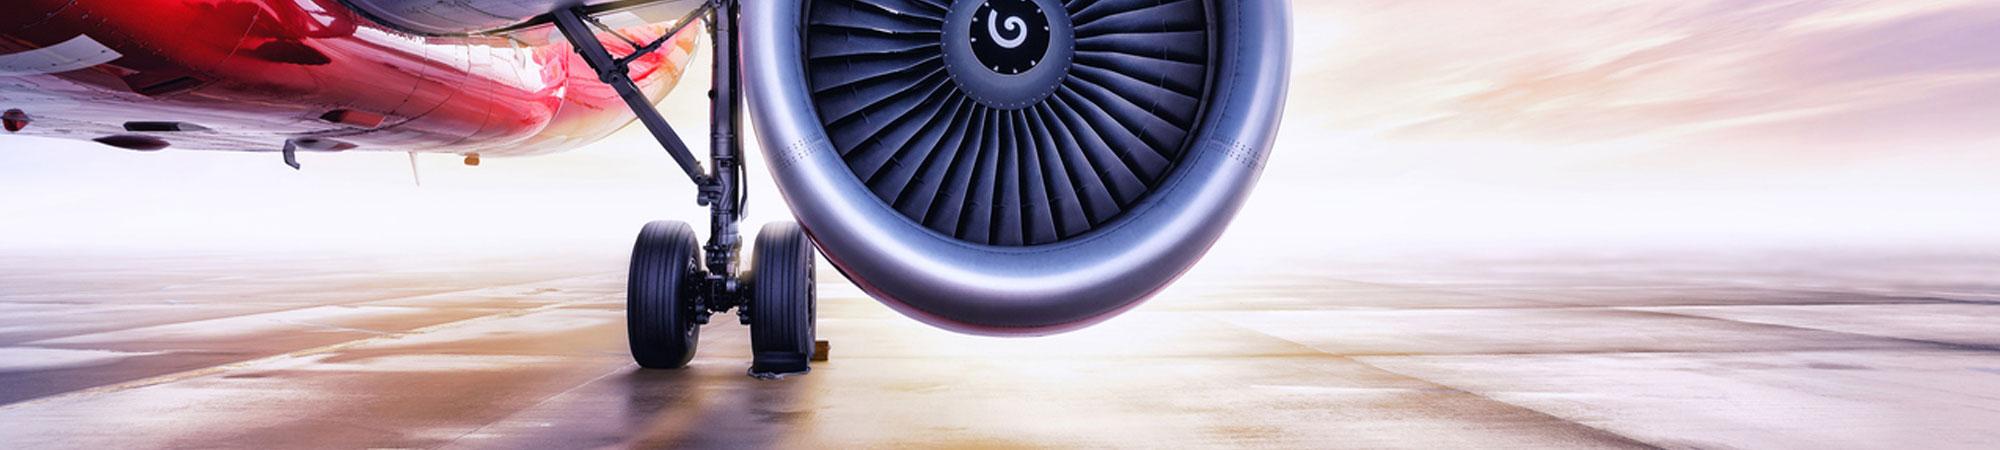 Defence & Aerospace - Maintenance & Repair